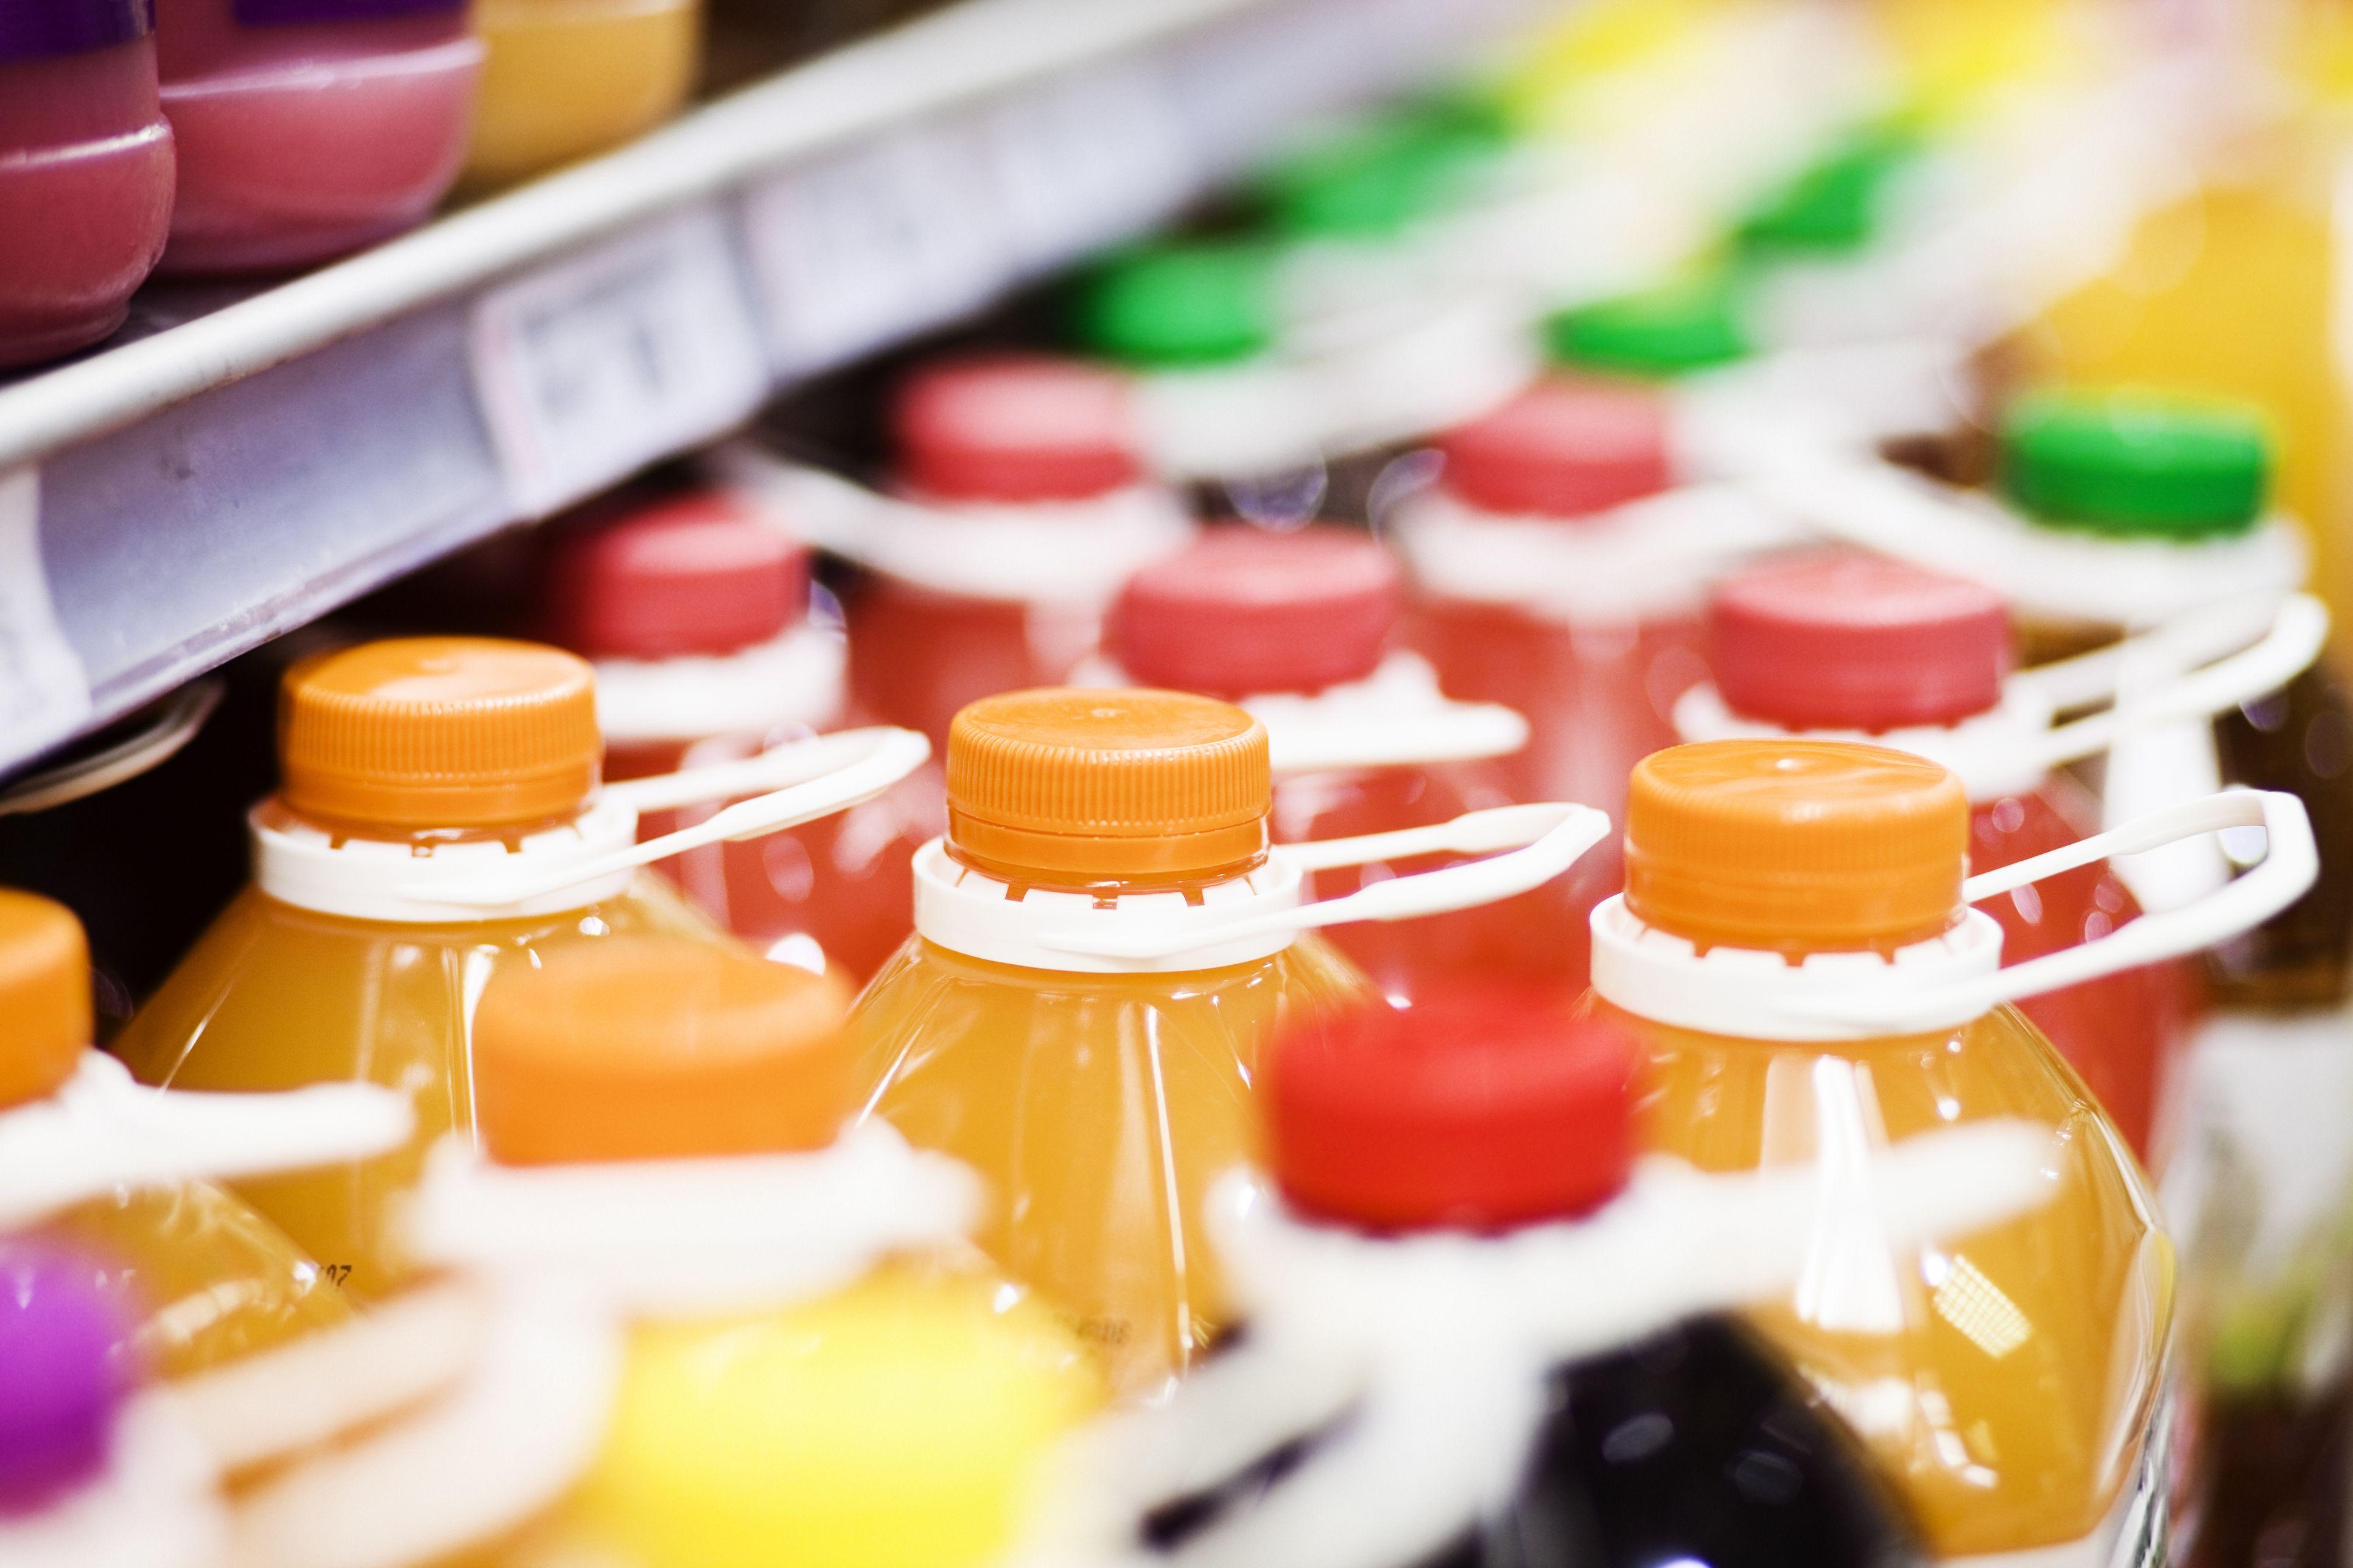 Juice in a supermarket